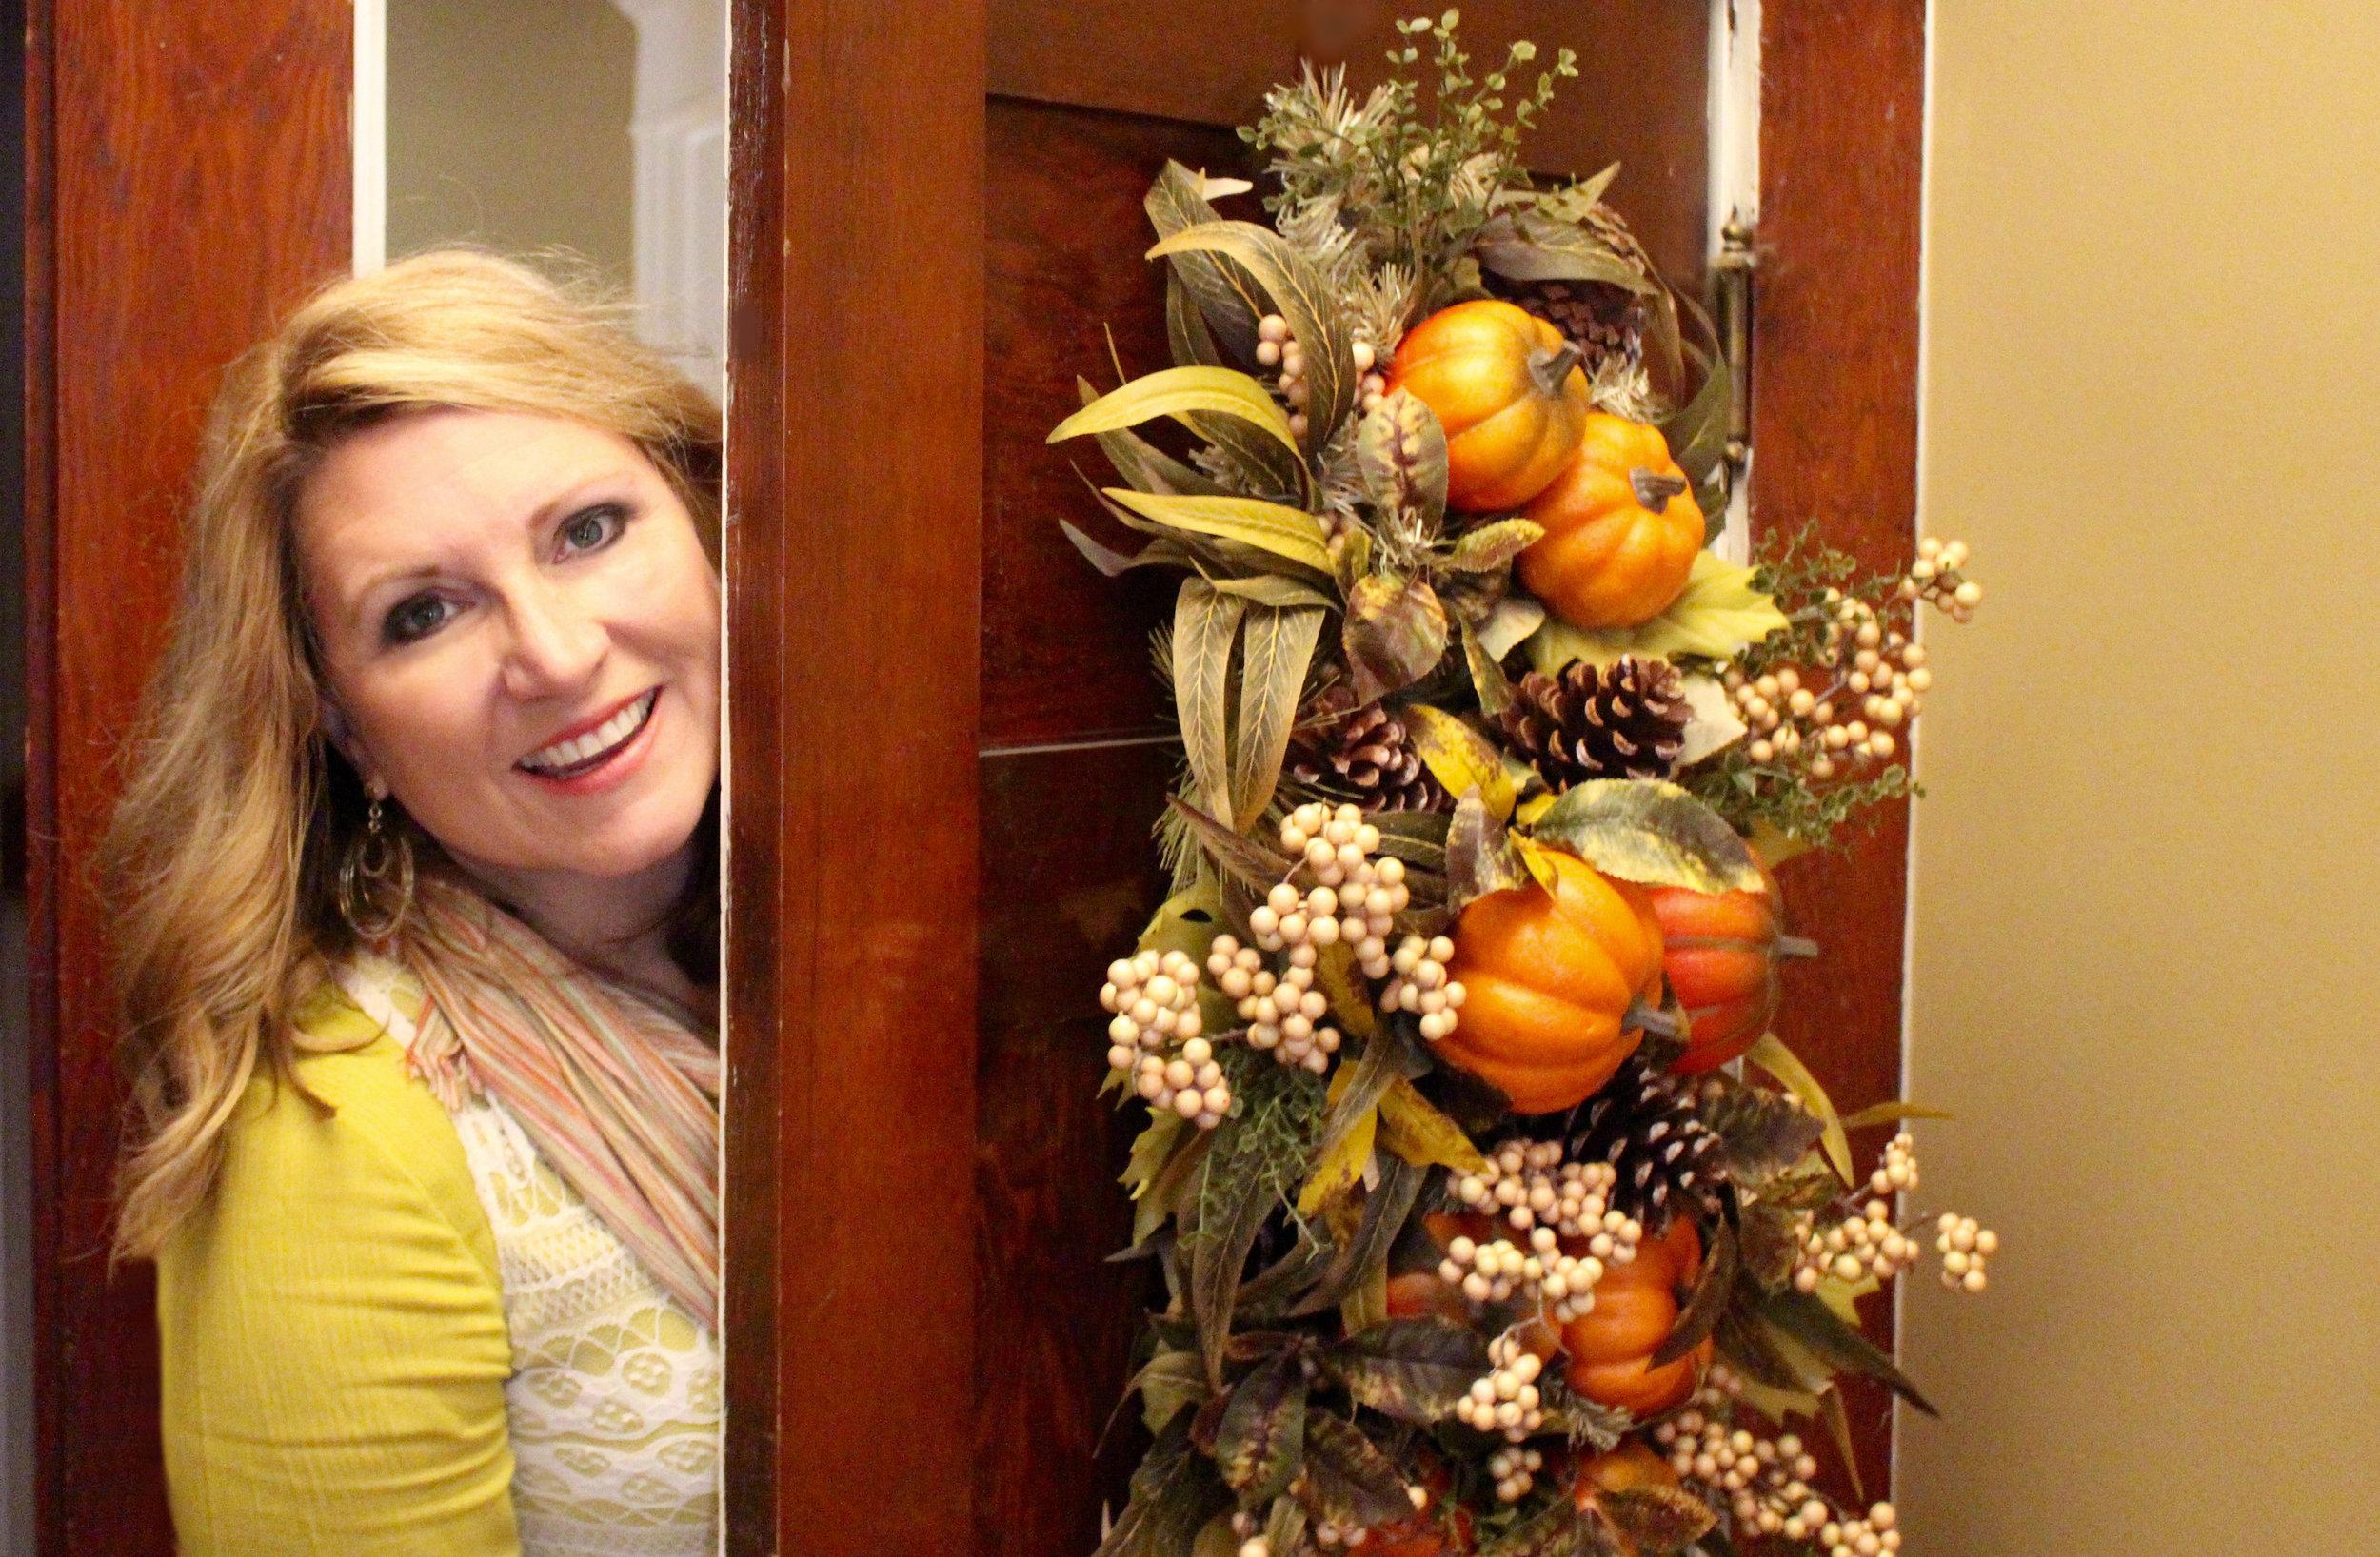 Love the Balsam Hill Autumn Abundance collection!